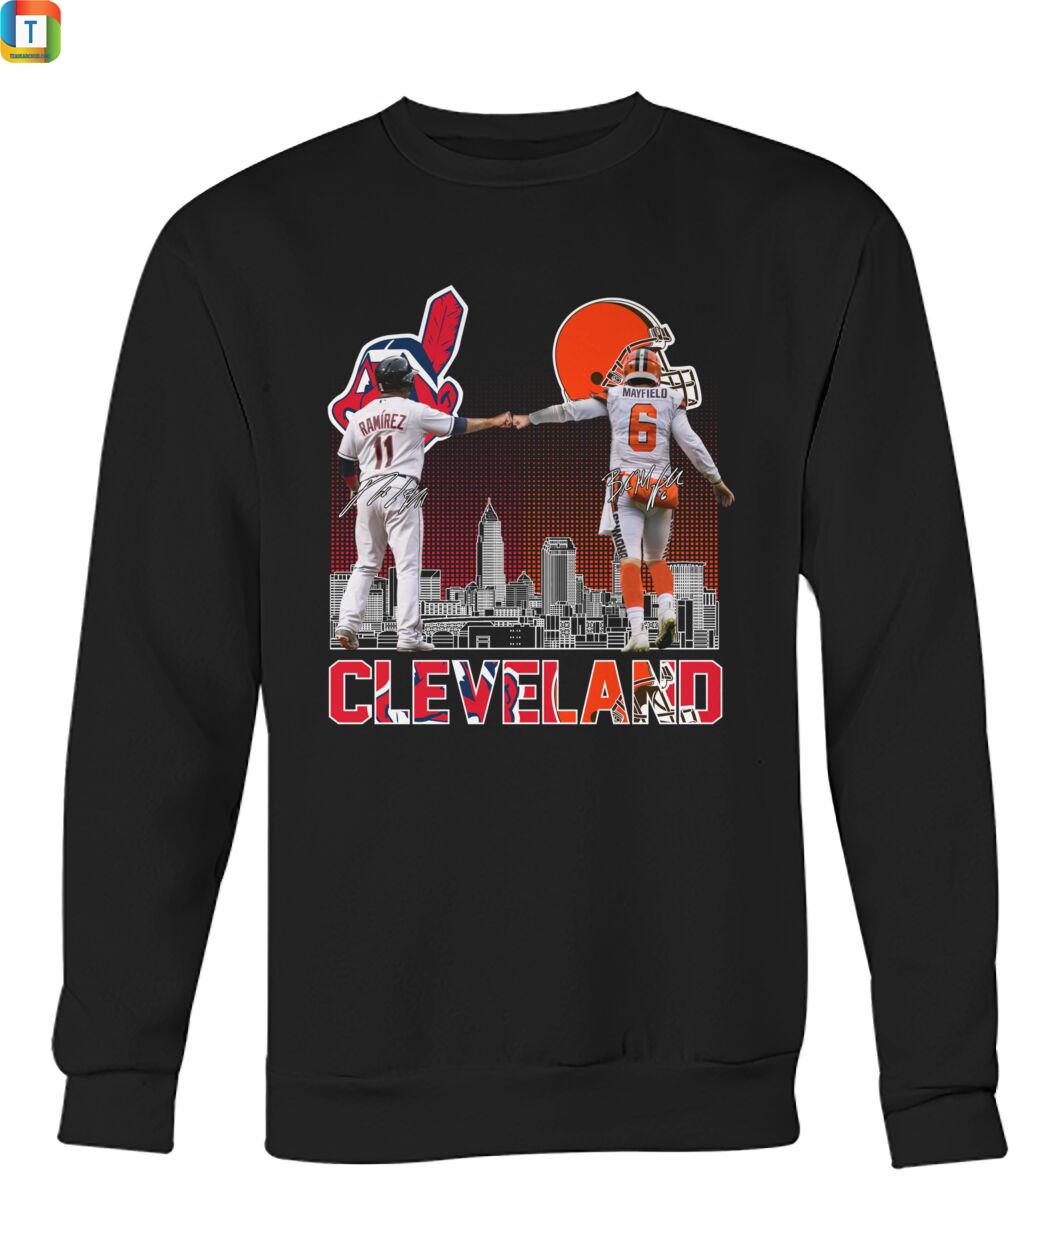 Cleveland José Ramirez And Baker Mayfield Signature sweatshirt